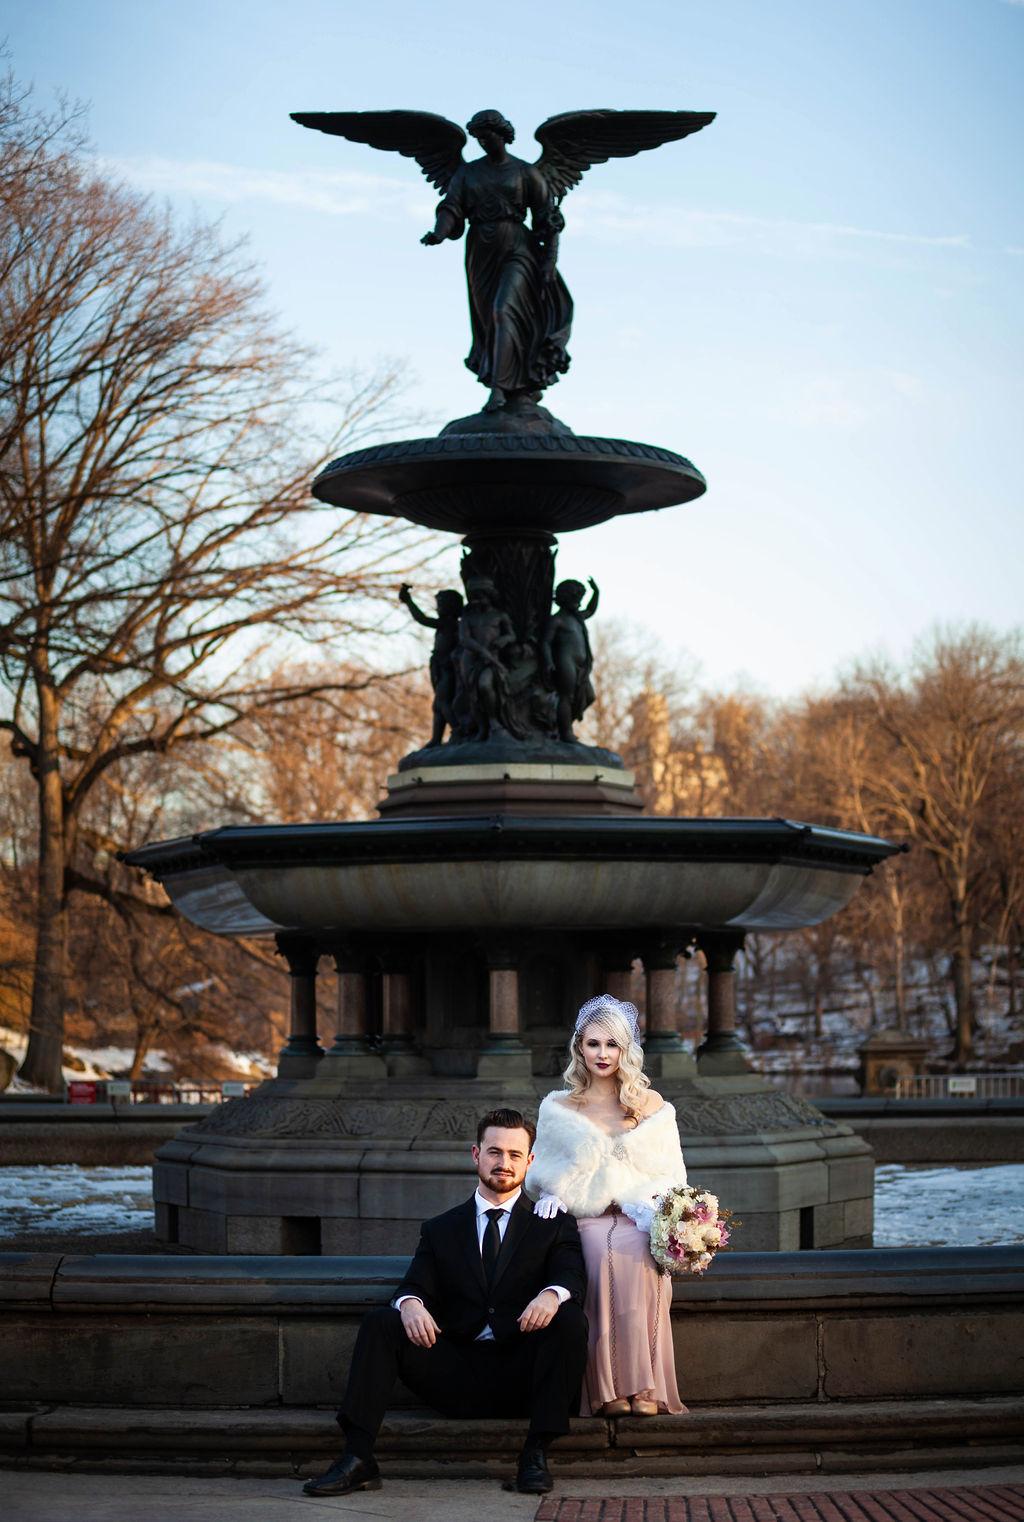 Vintage_Winter_Wedding_CentralPark-26_pp.jpg